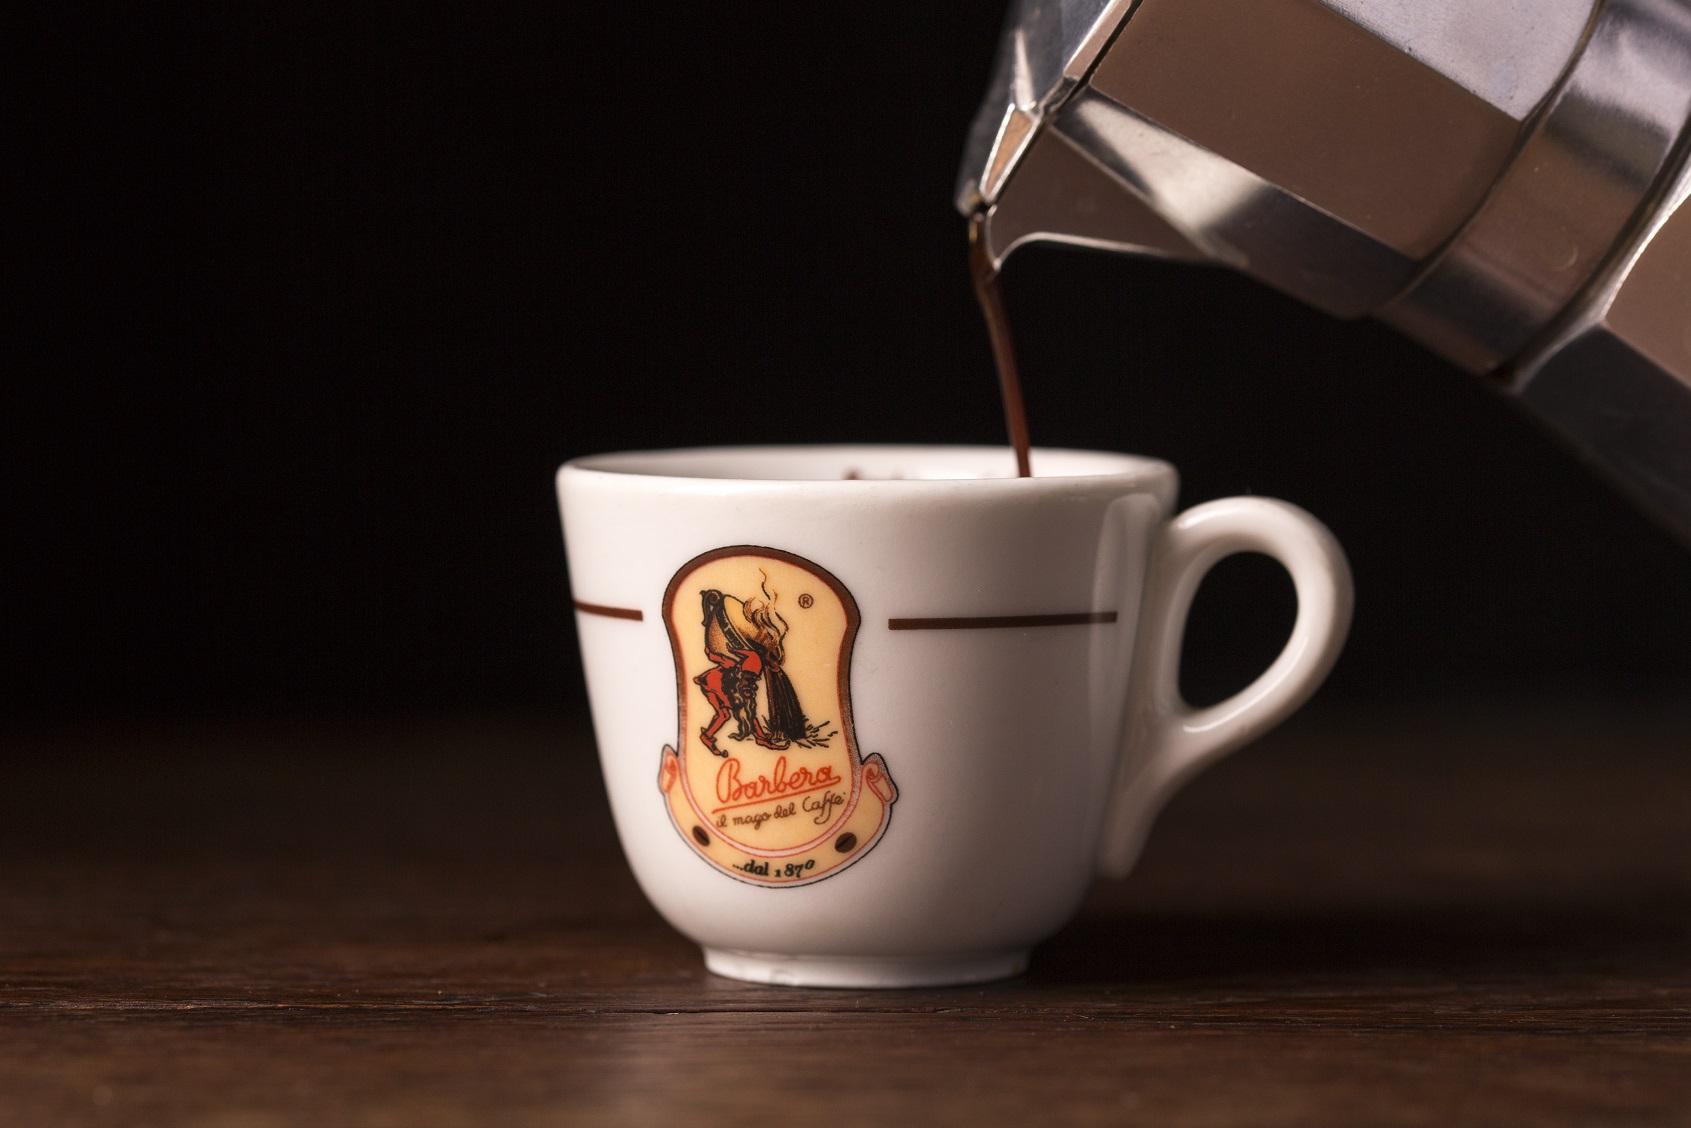 Barbera-1870-Neapel-der-Kaffeemagier